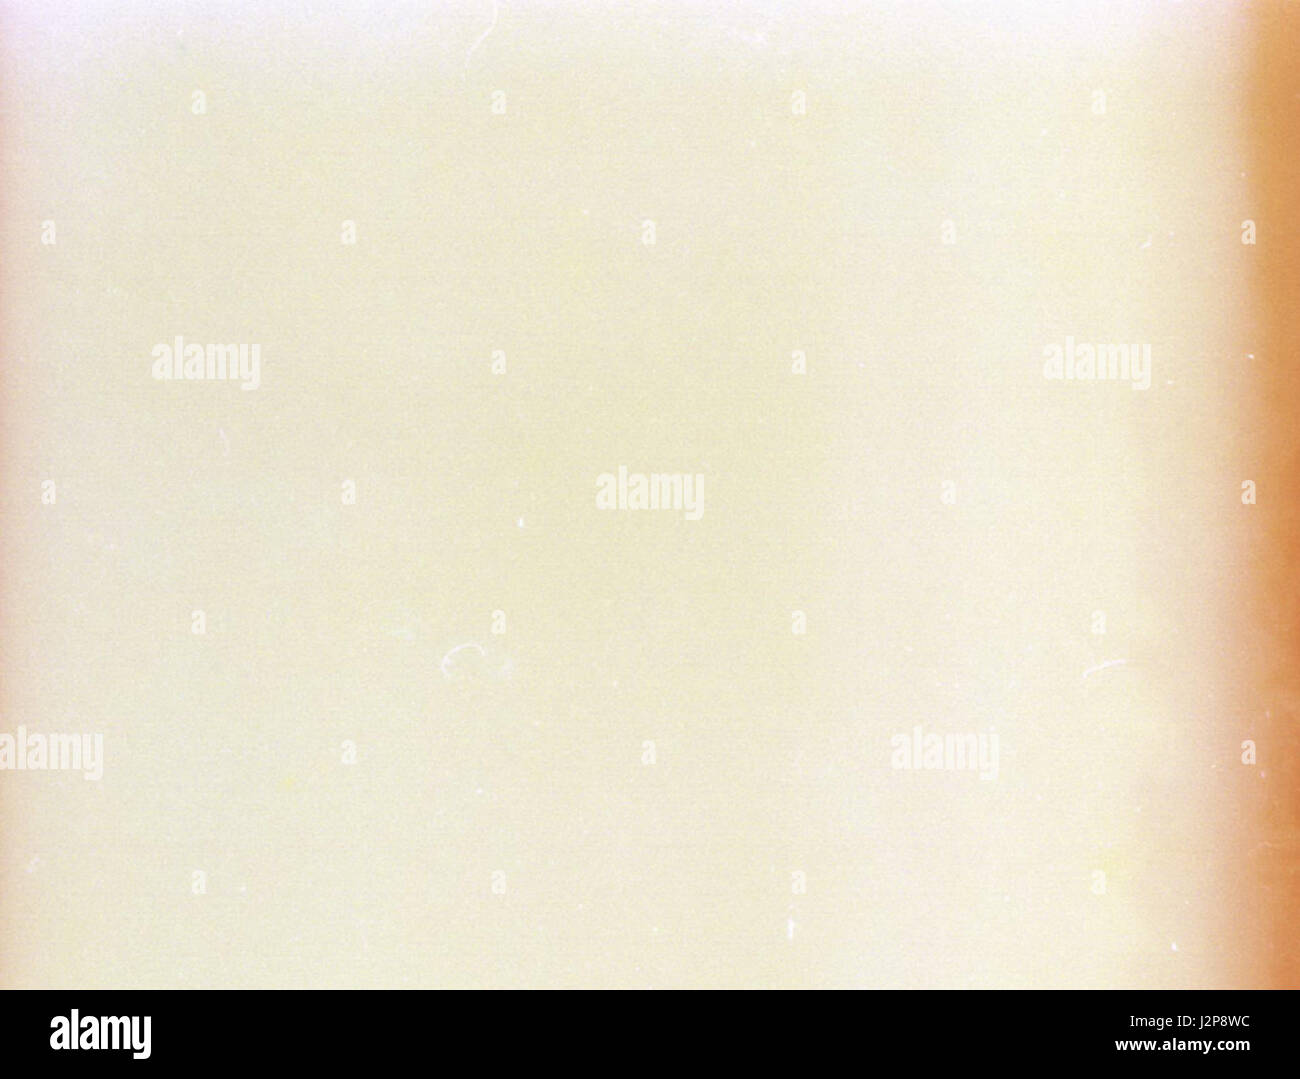 Old film filament hand broken.Blank old grunge film strip frame background. Vector format. Stock Photo